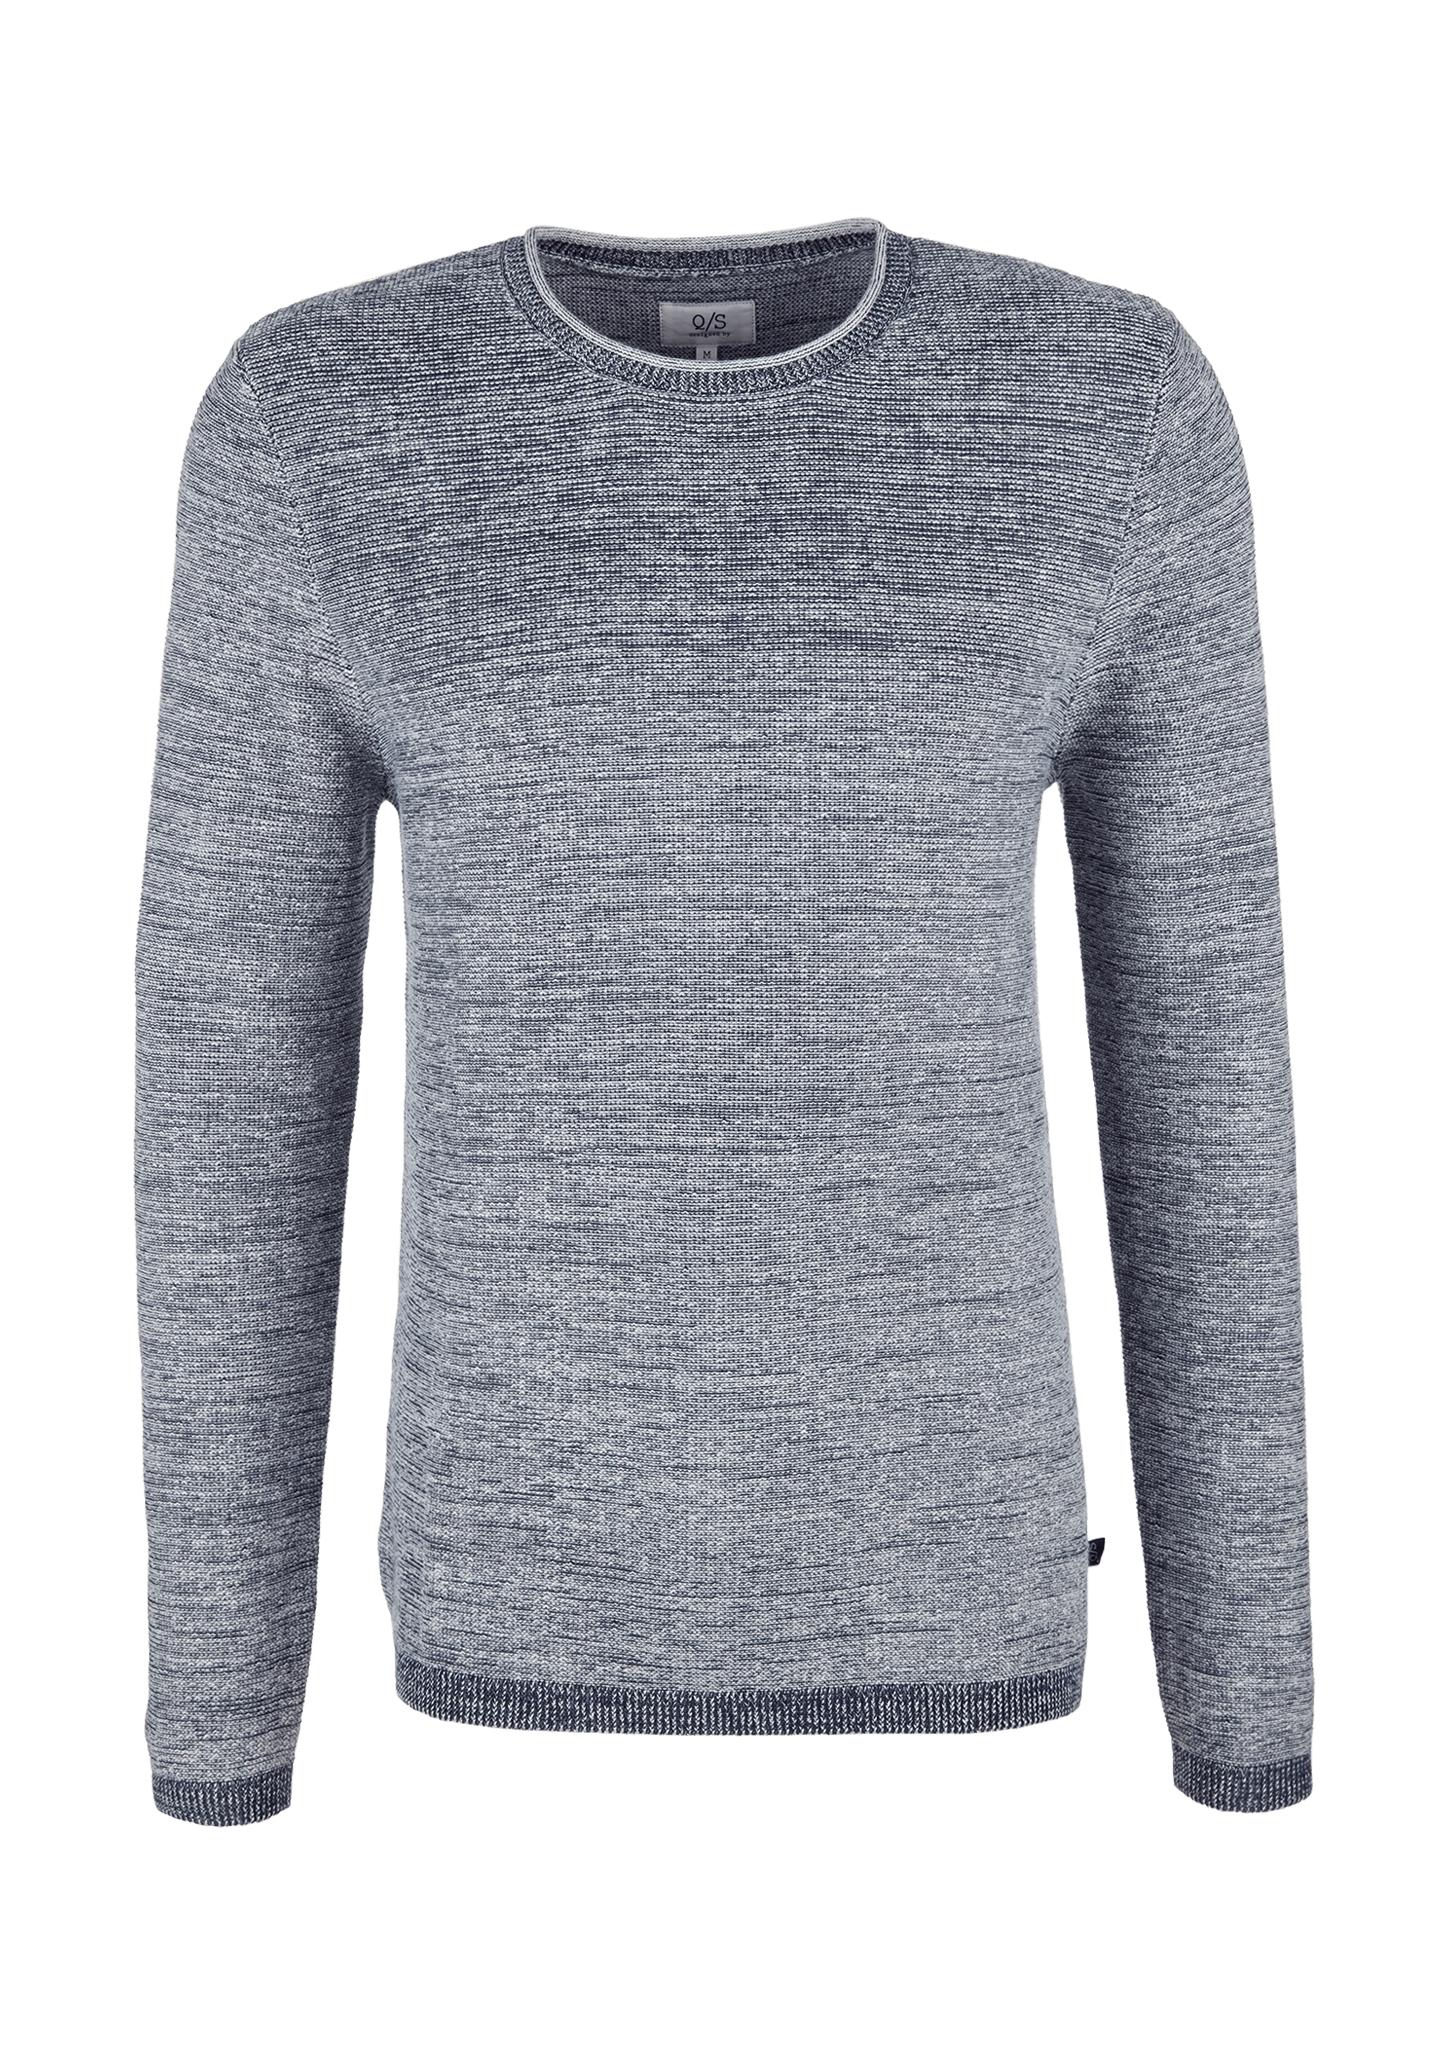 Pullover   Bekleidung > Pullover > Sonstige Pullover   Blau   100% baumwolle   Q/S designed by